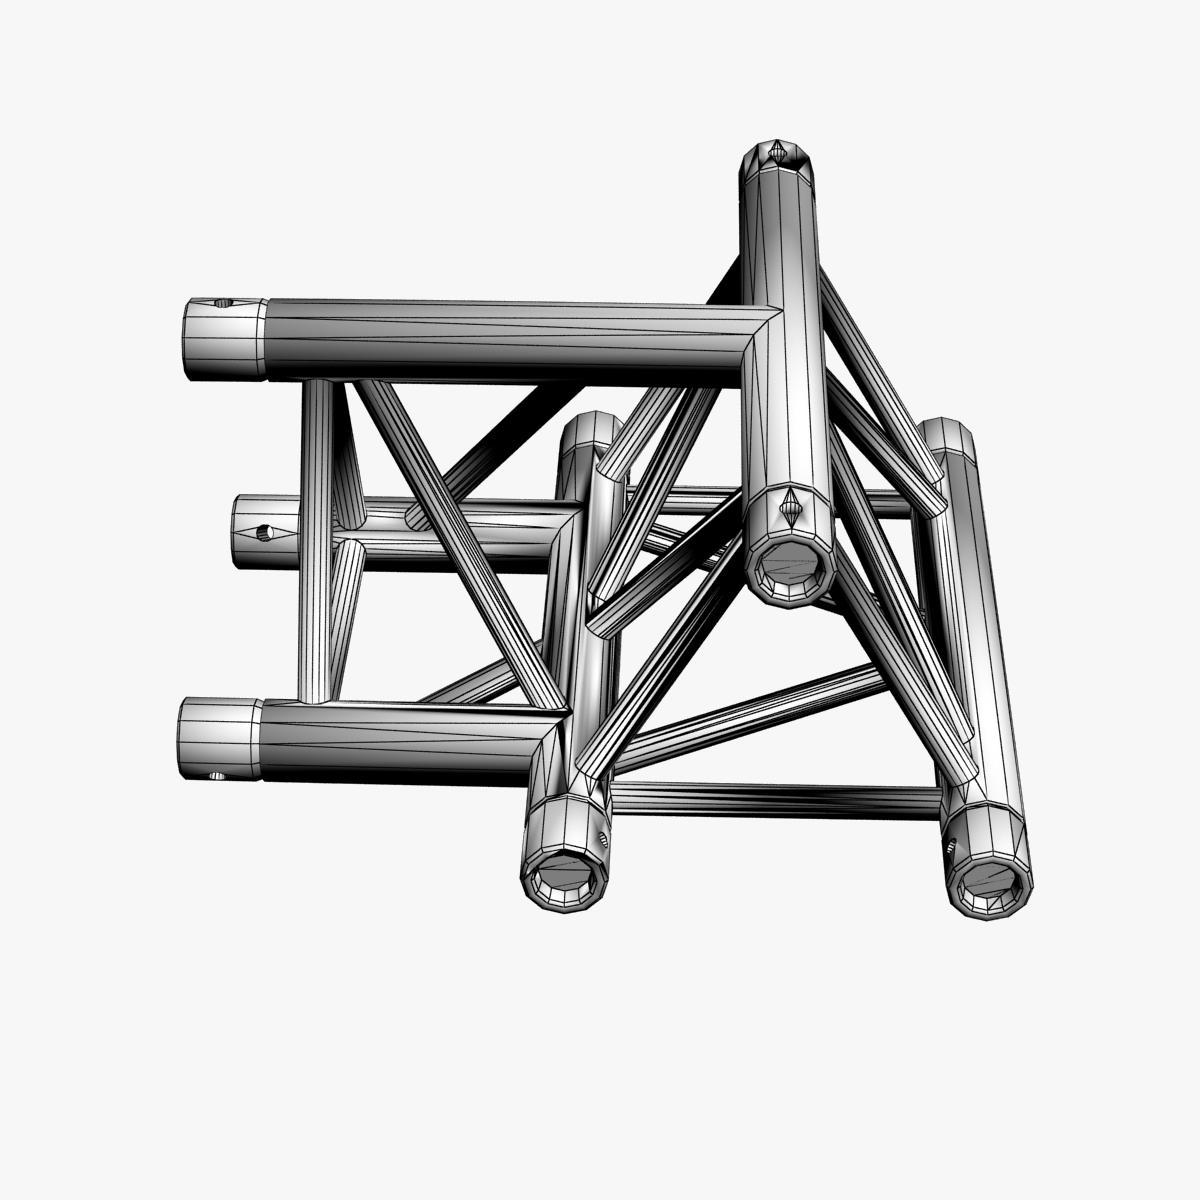 Triangular Truss Cross T Junction 84 3d model 3ds max dxf fbx b3d c4d  obj 268953